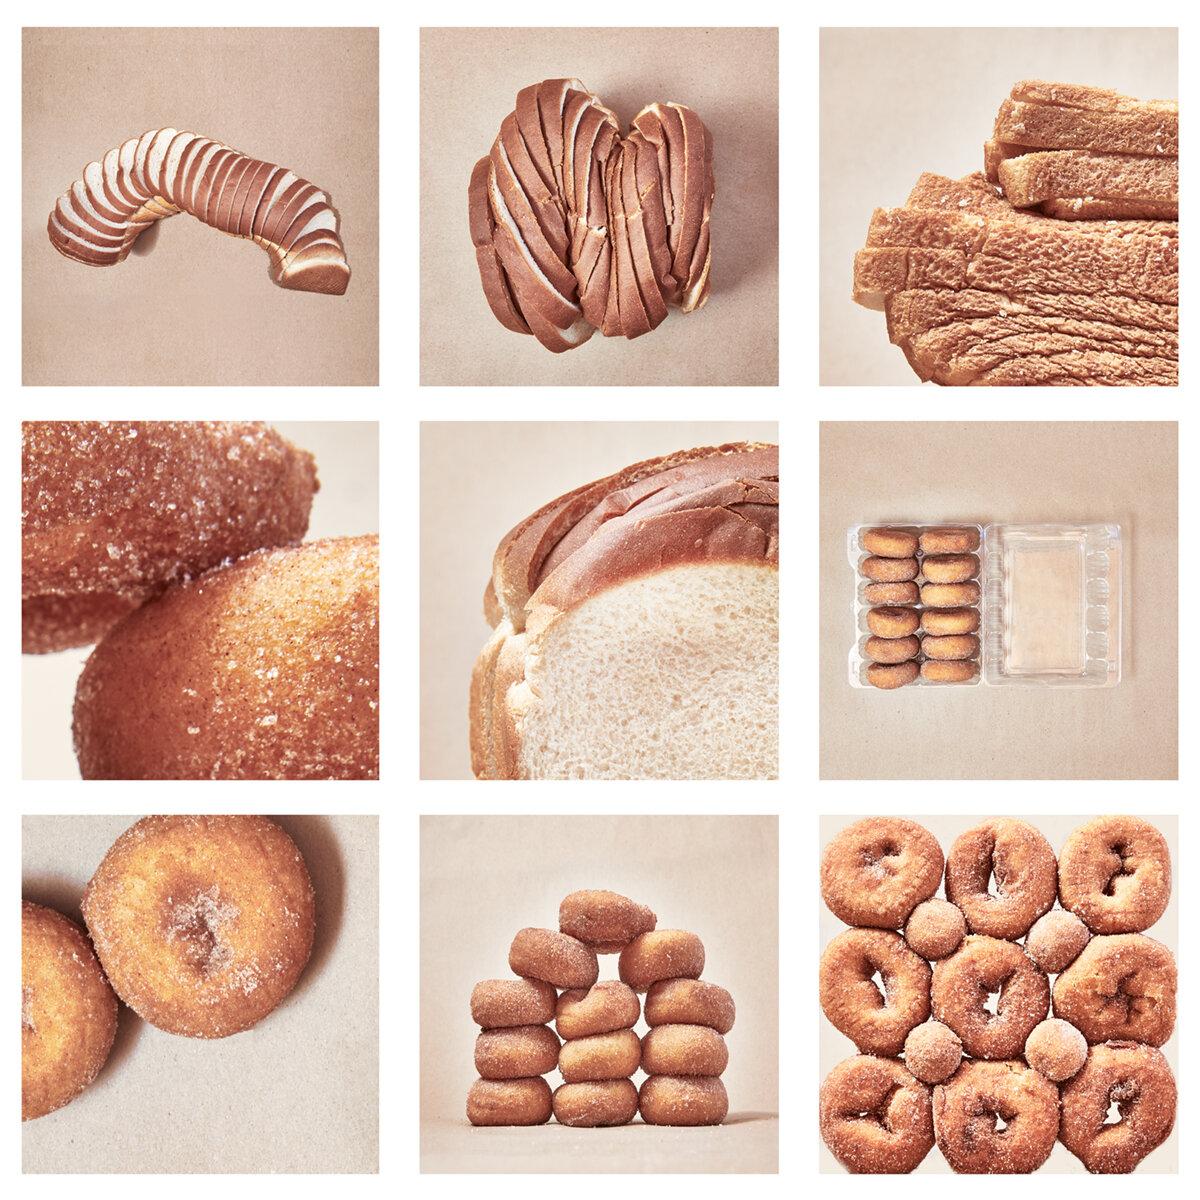 Bread4_Study_small.jpg